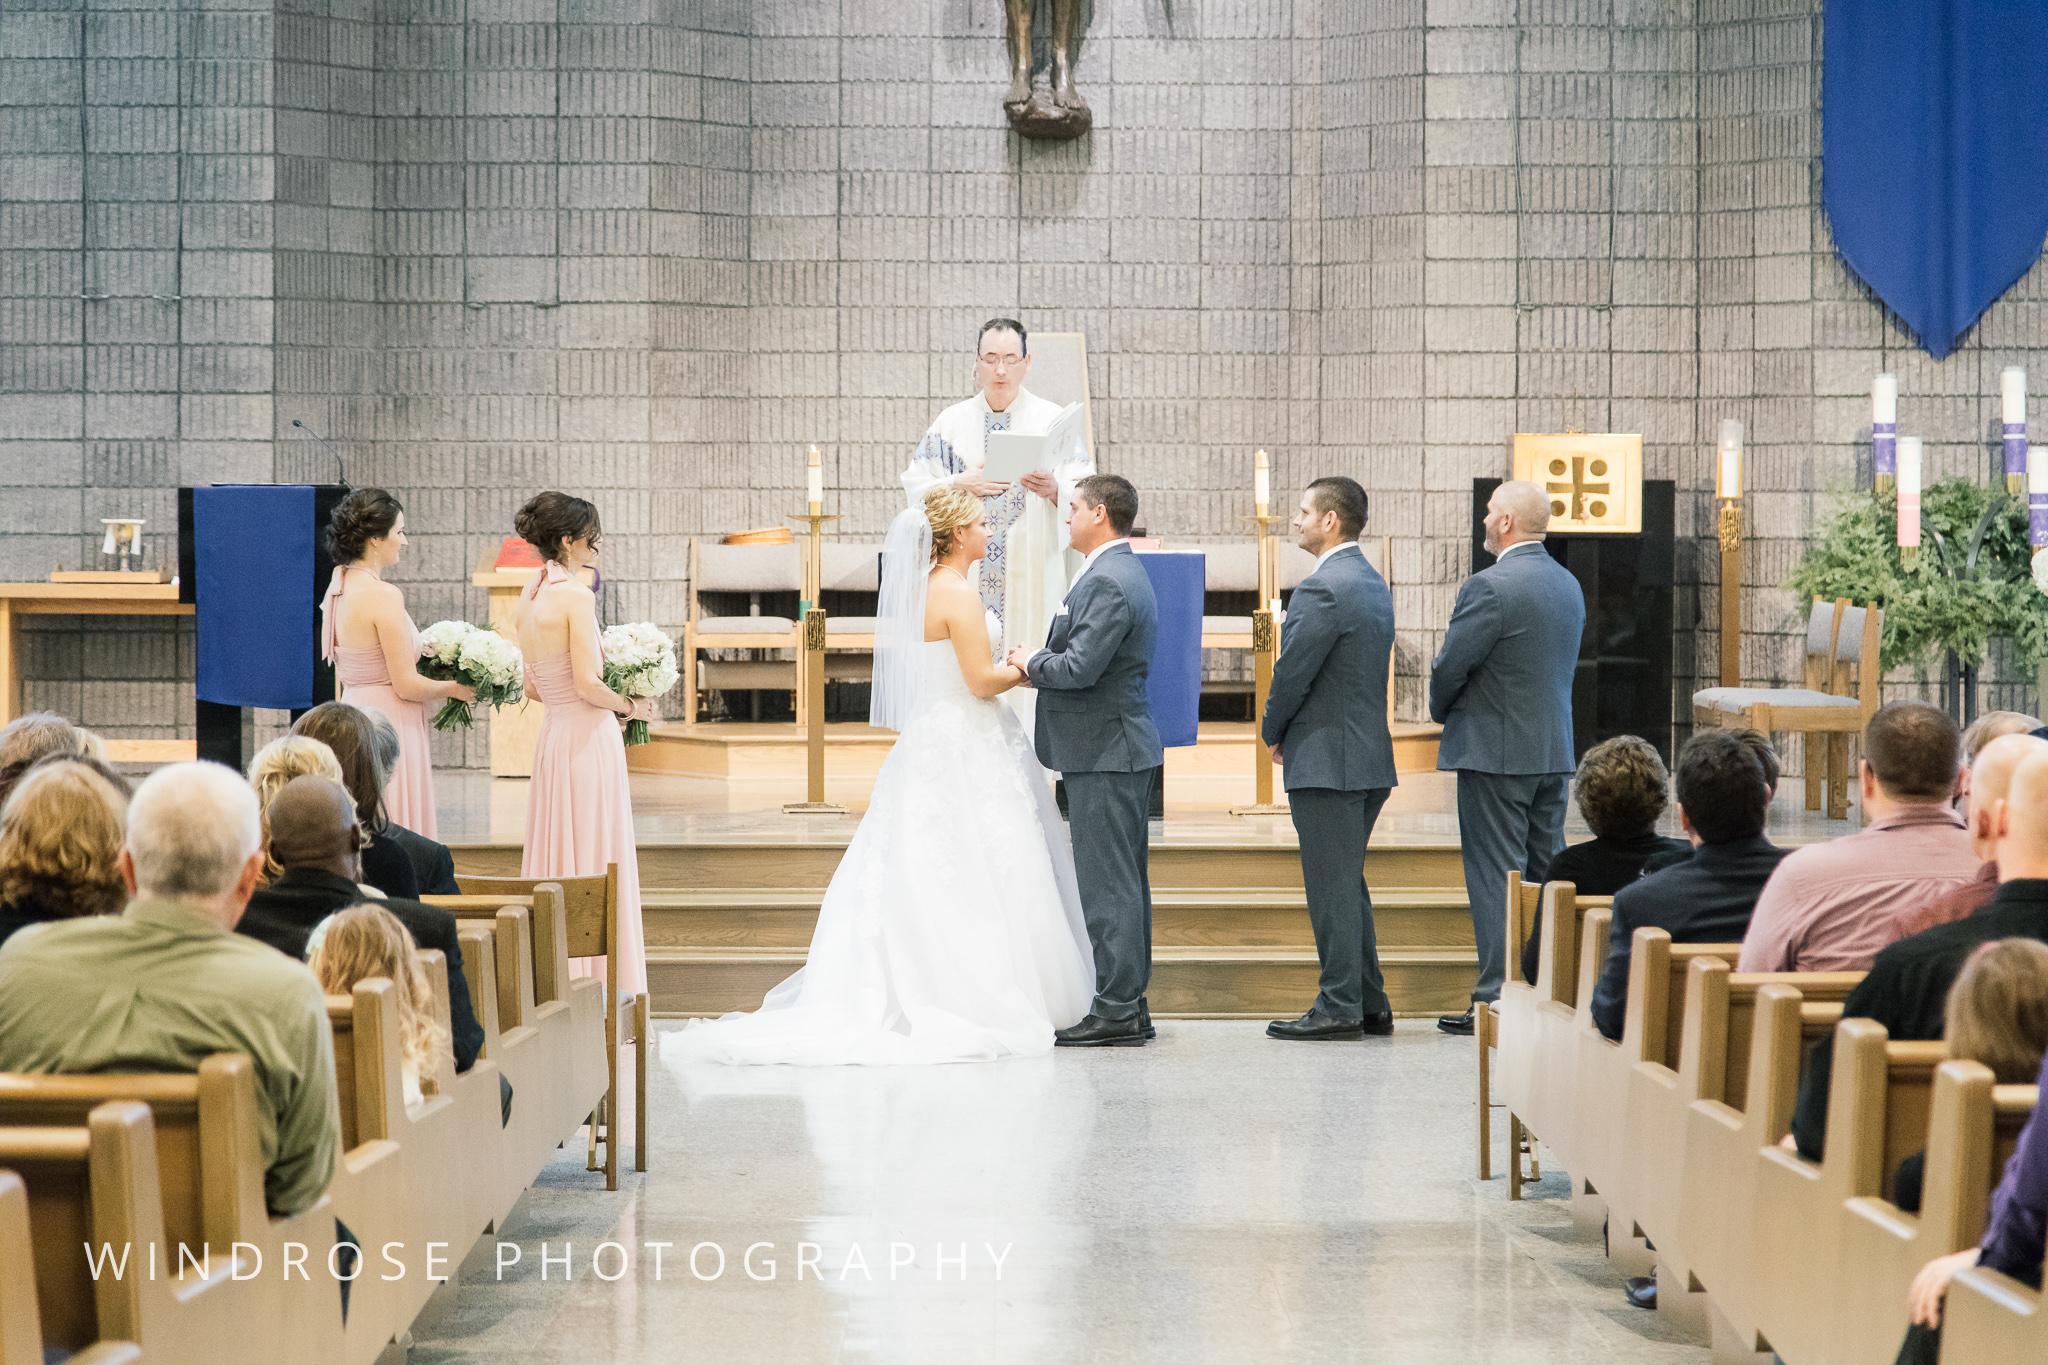 Rochester-MN-Wedding-Photo-22.jpg